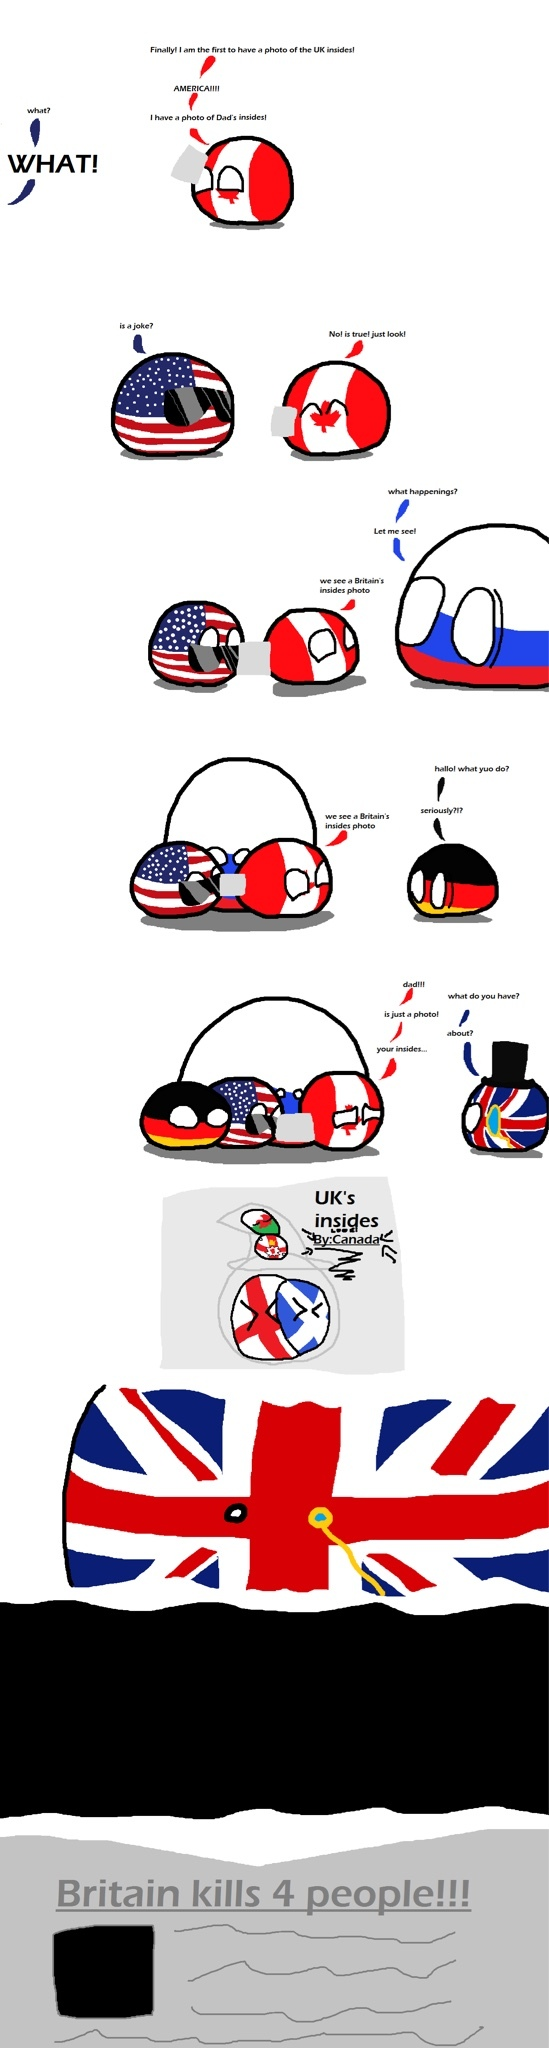 U.K.'s insides - meme